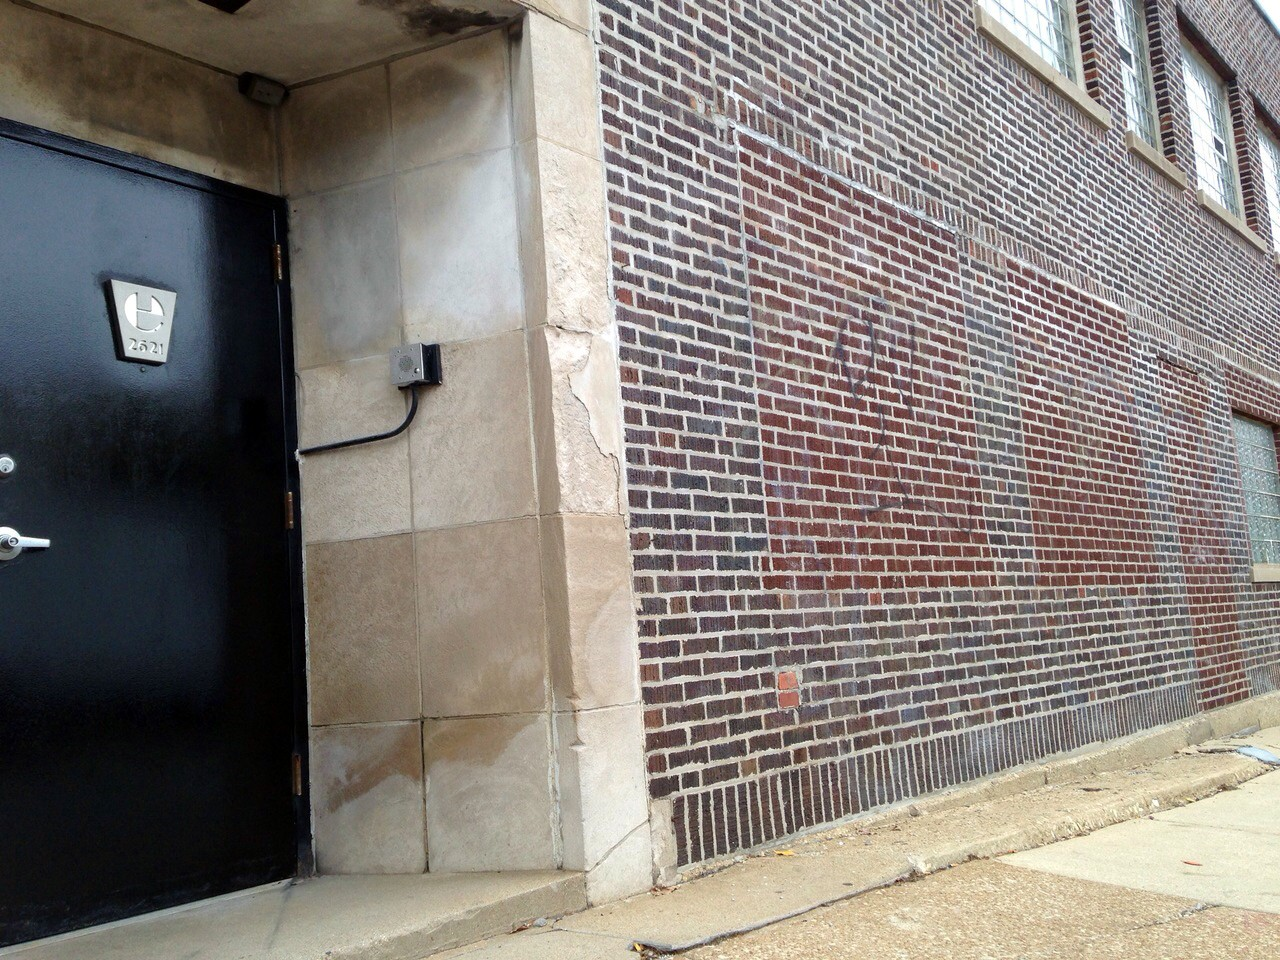 Electrical Audio Studio em Chicago (Foto: Louise Palma)